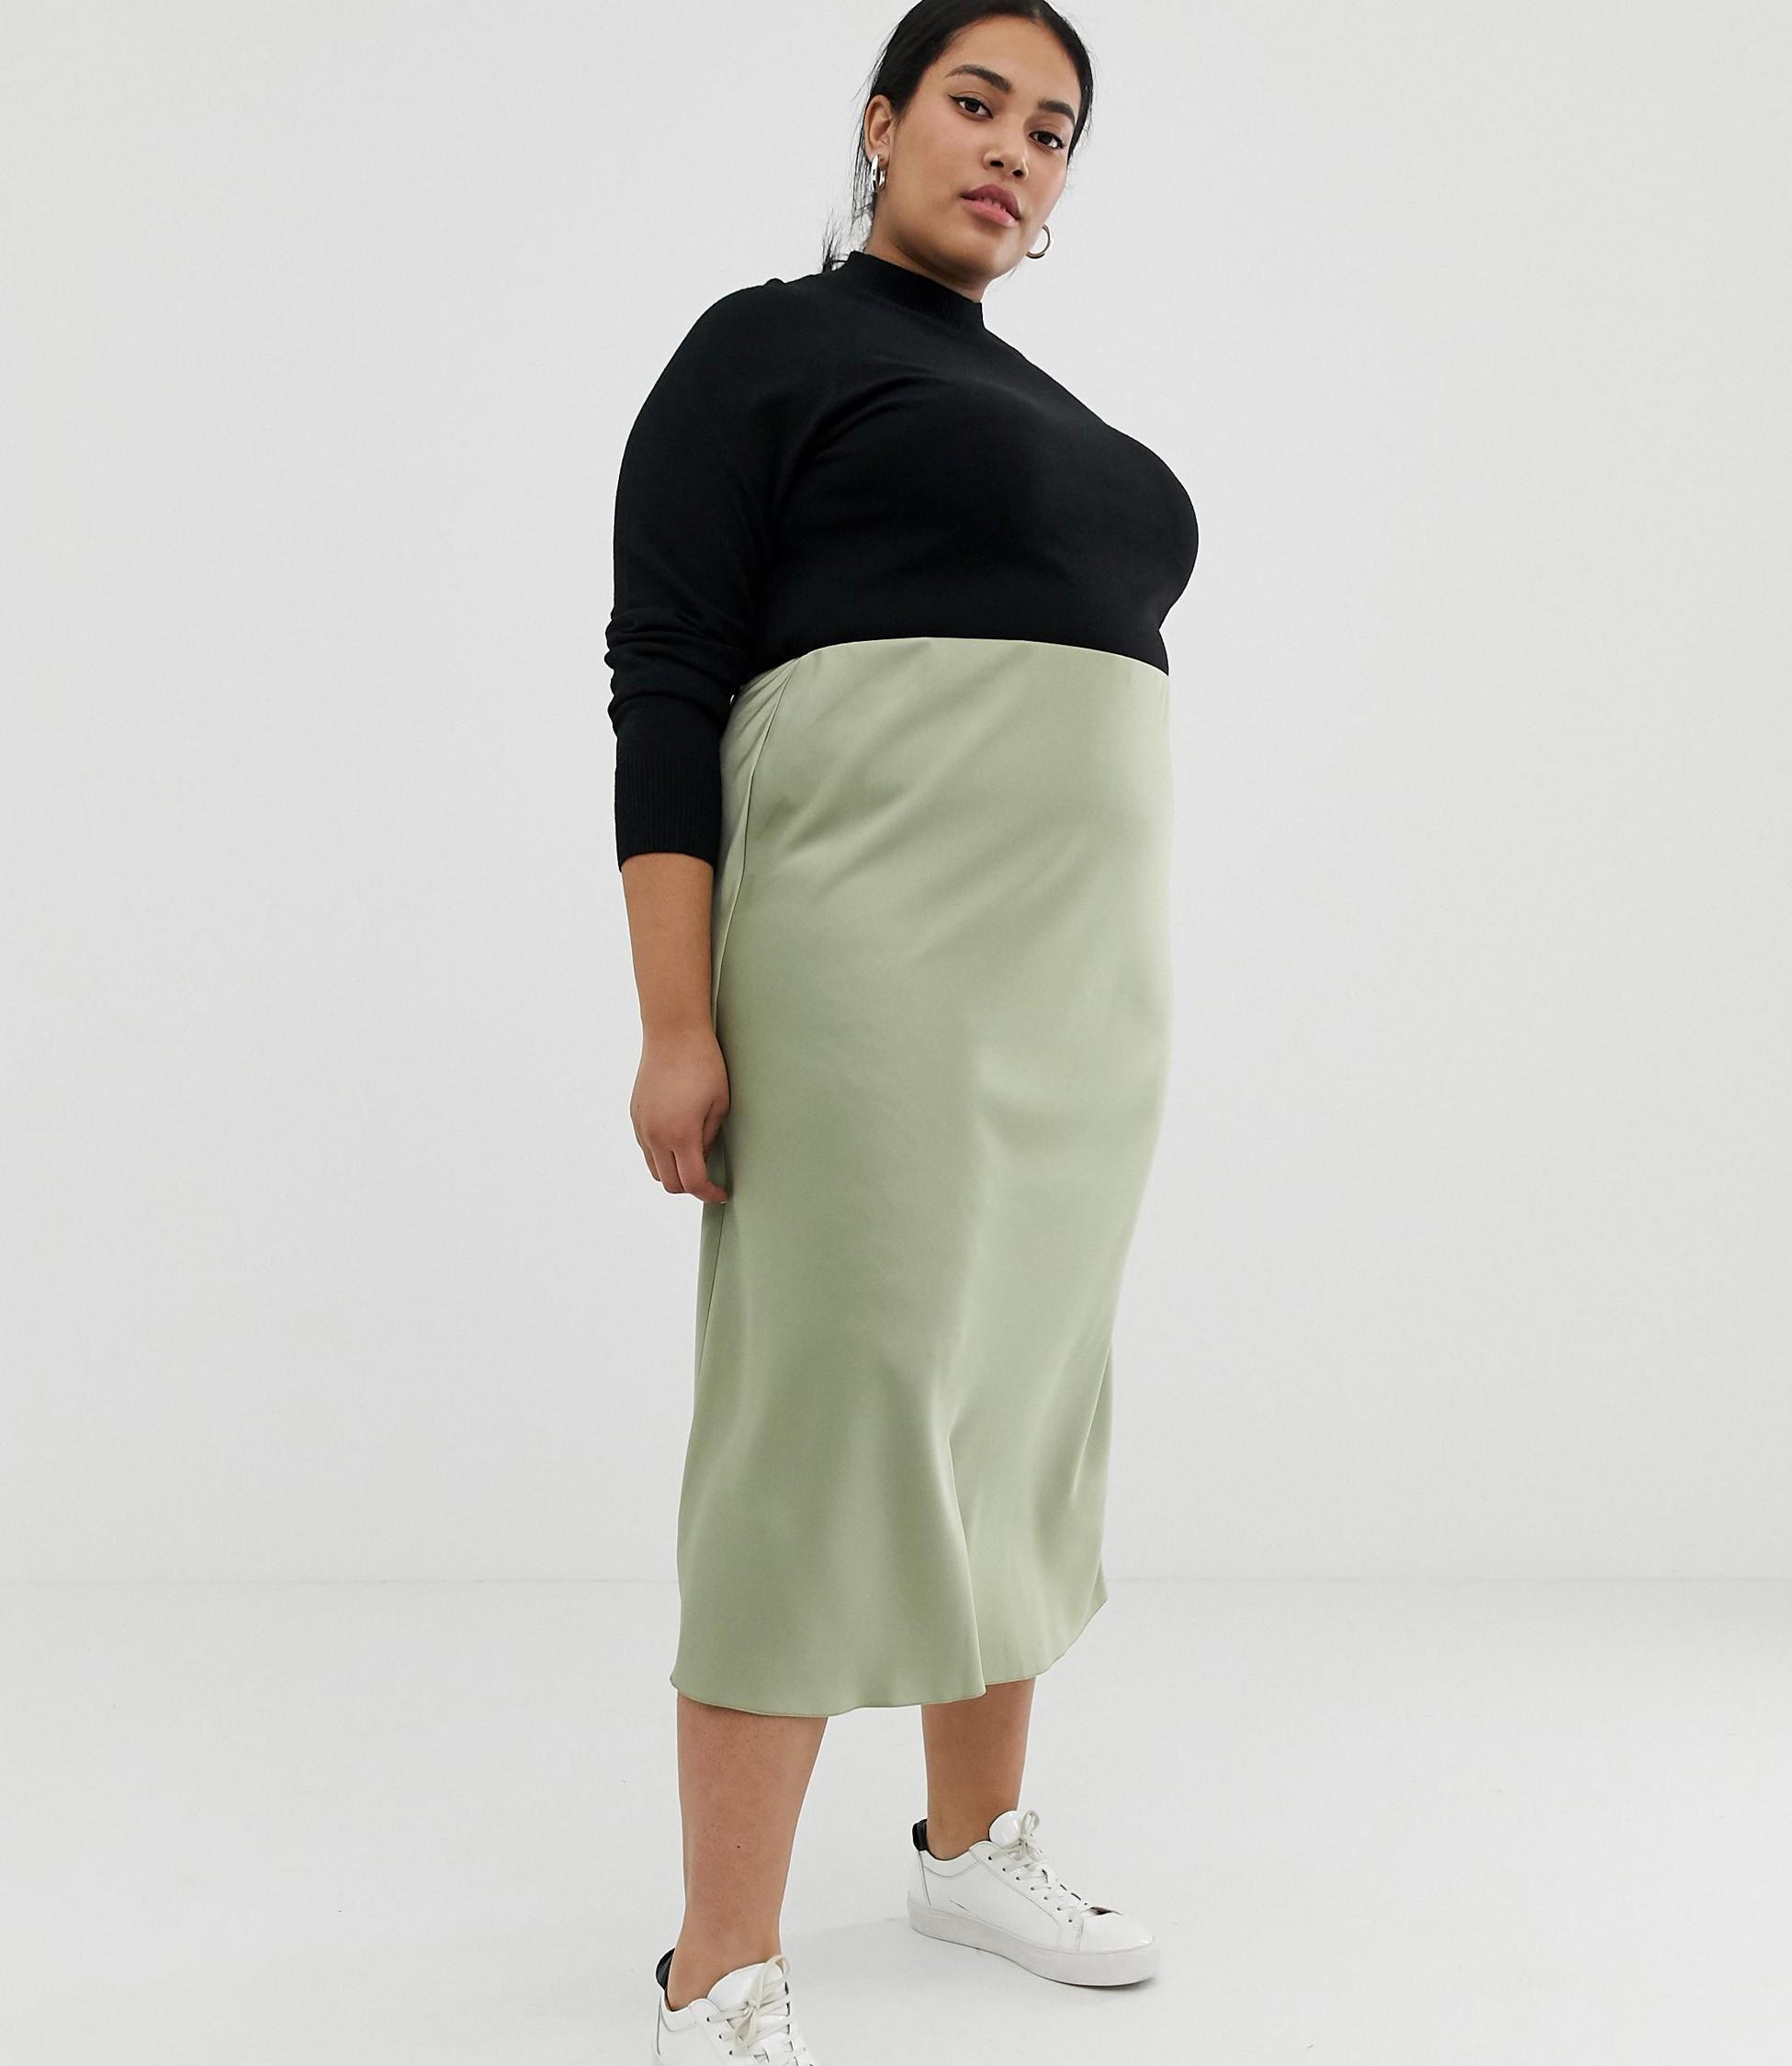 afdec08b9 ASOS CURVE + Curve Bias Cut Satin Slip Midi Skirt